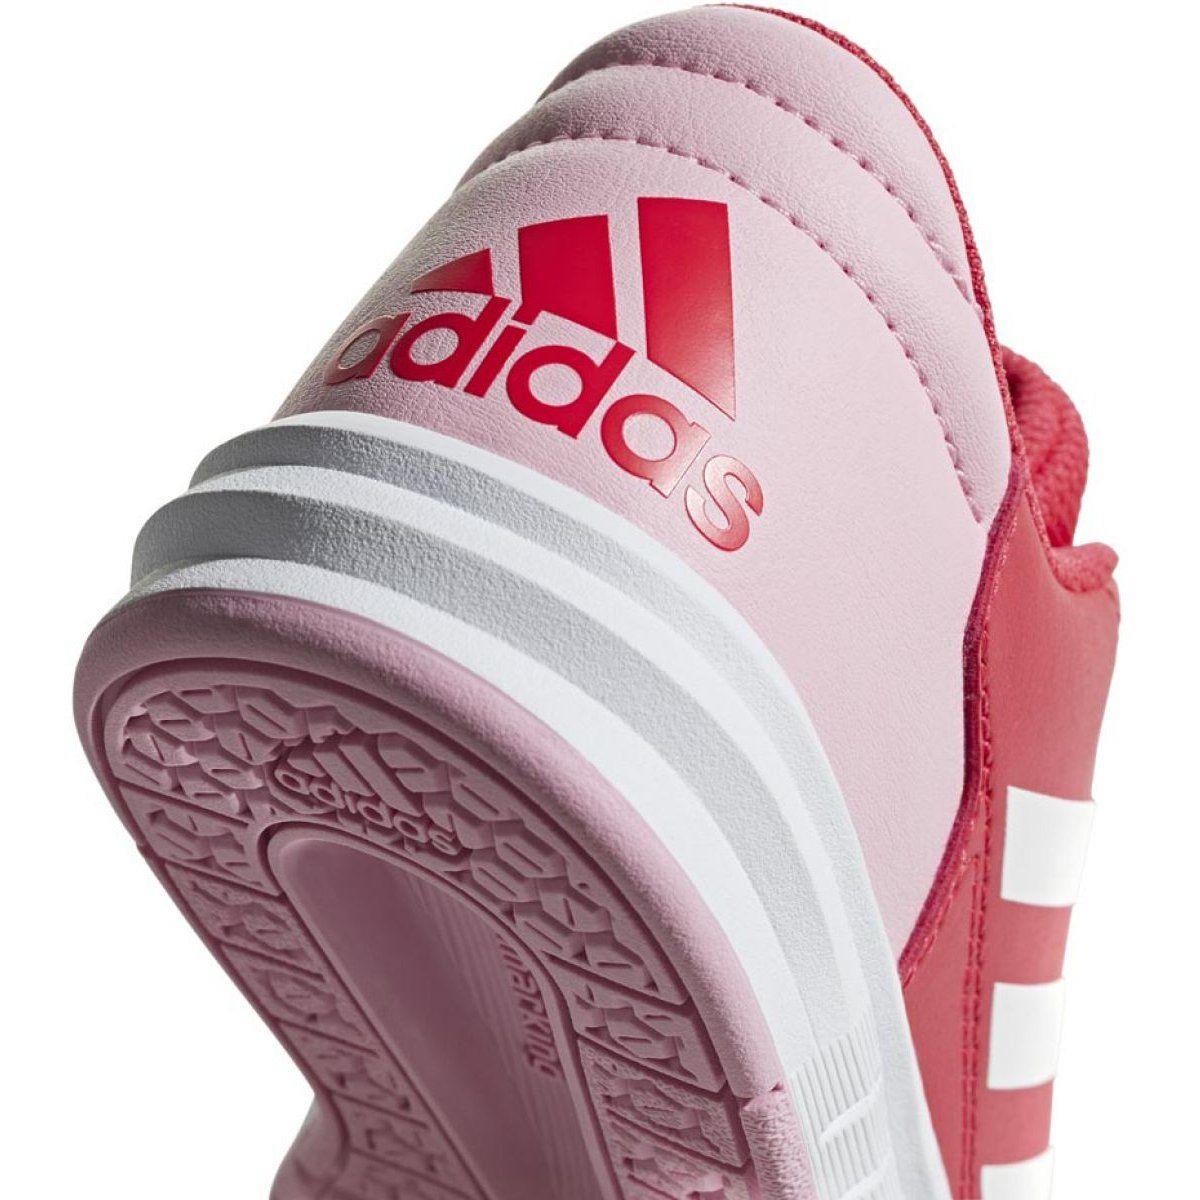 Buty Adidas Altasport K Jr D96866 Czerwone Sports Shoes Adidas Childrens Shoes Kid Shoes